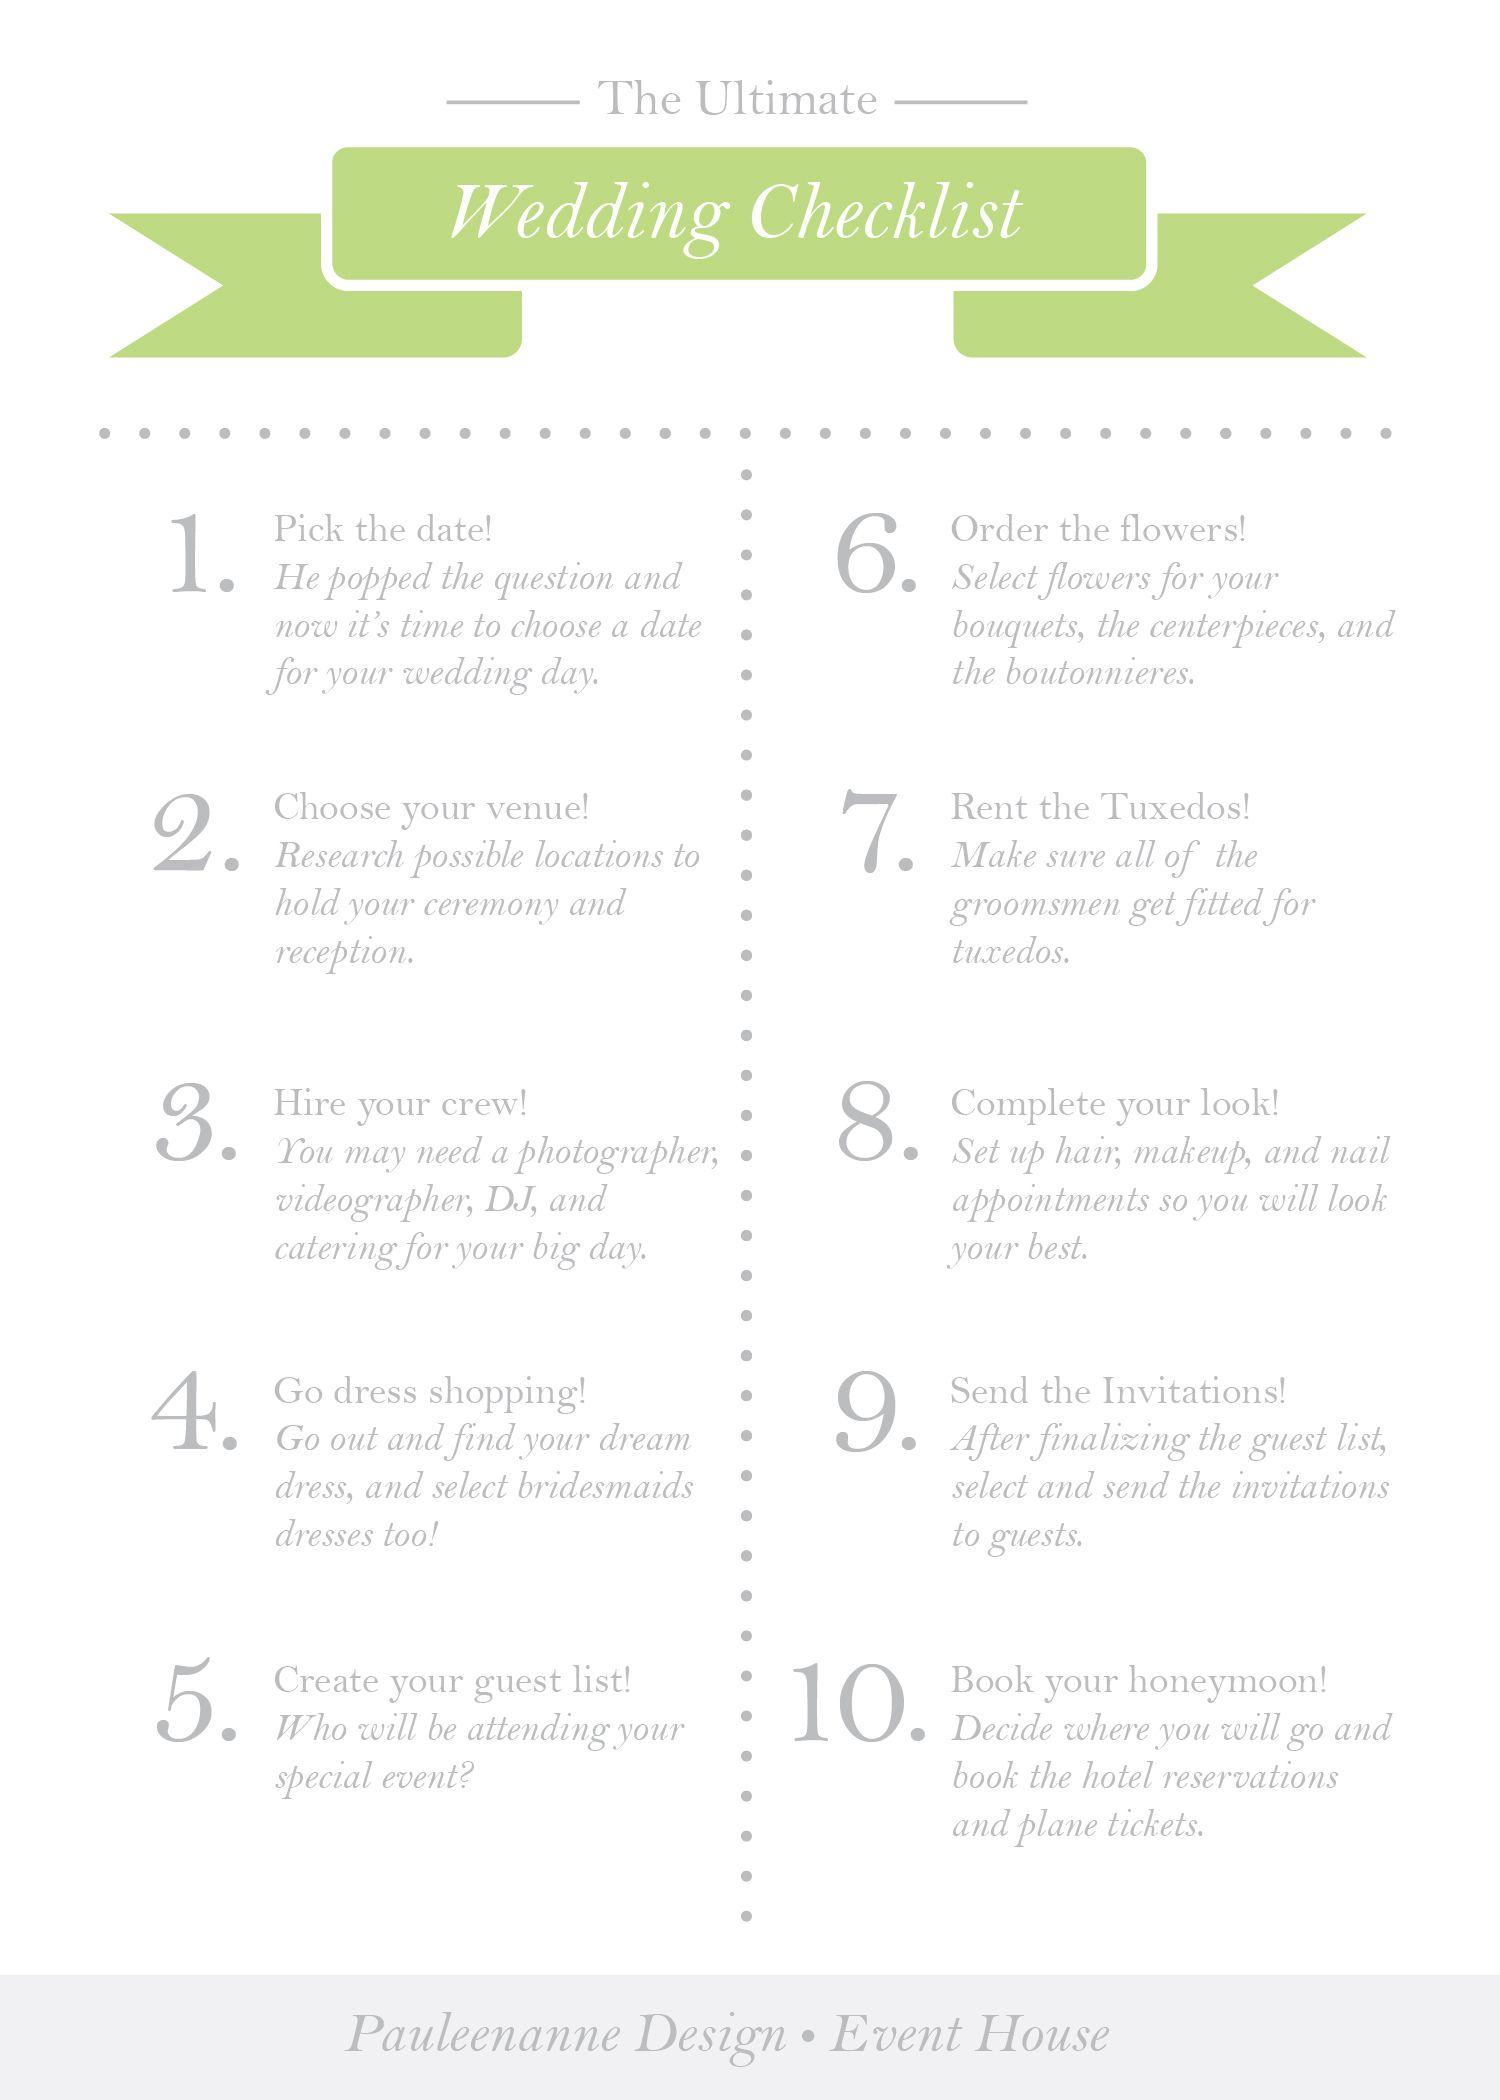 The Ultimate Wedding Checklist | Pauleenanne Design Event & Brand